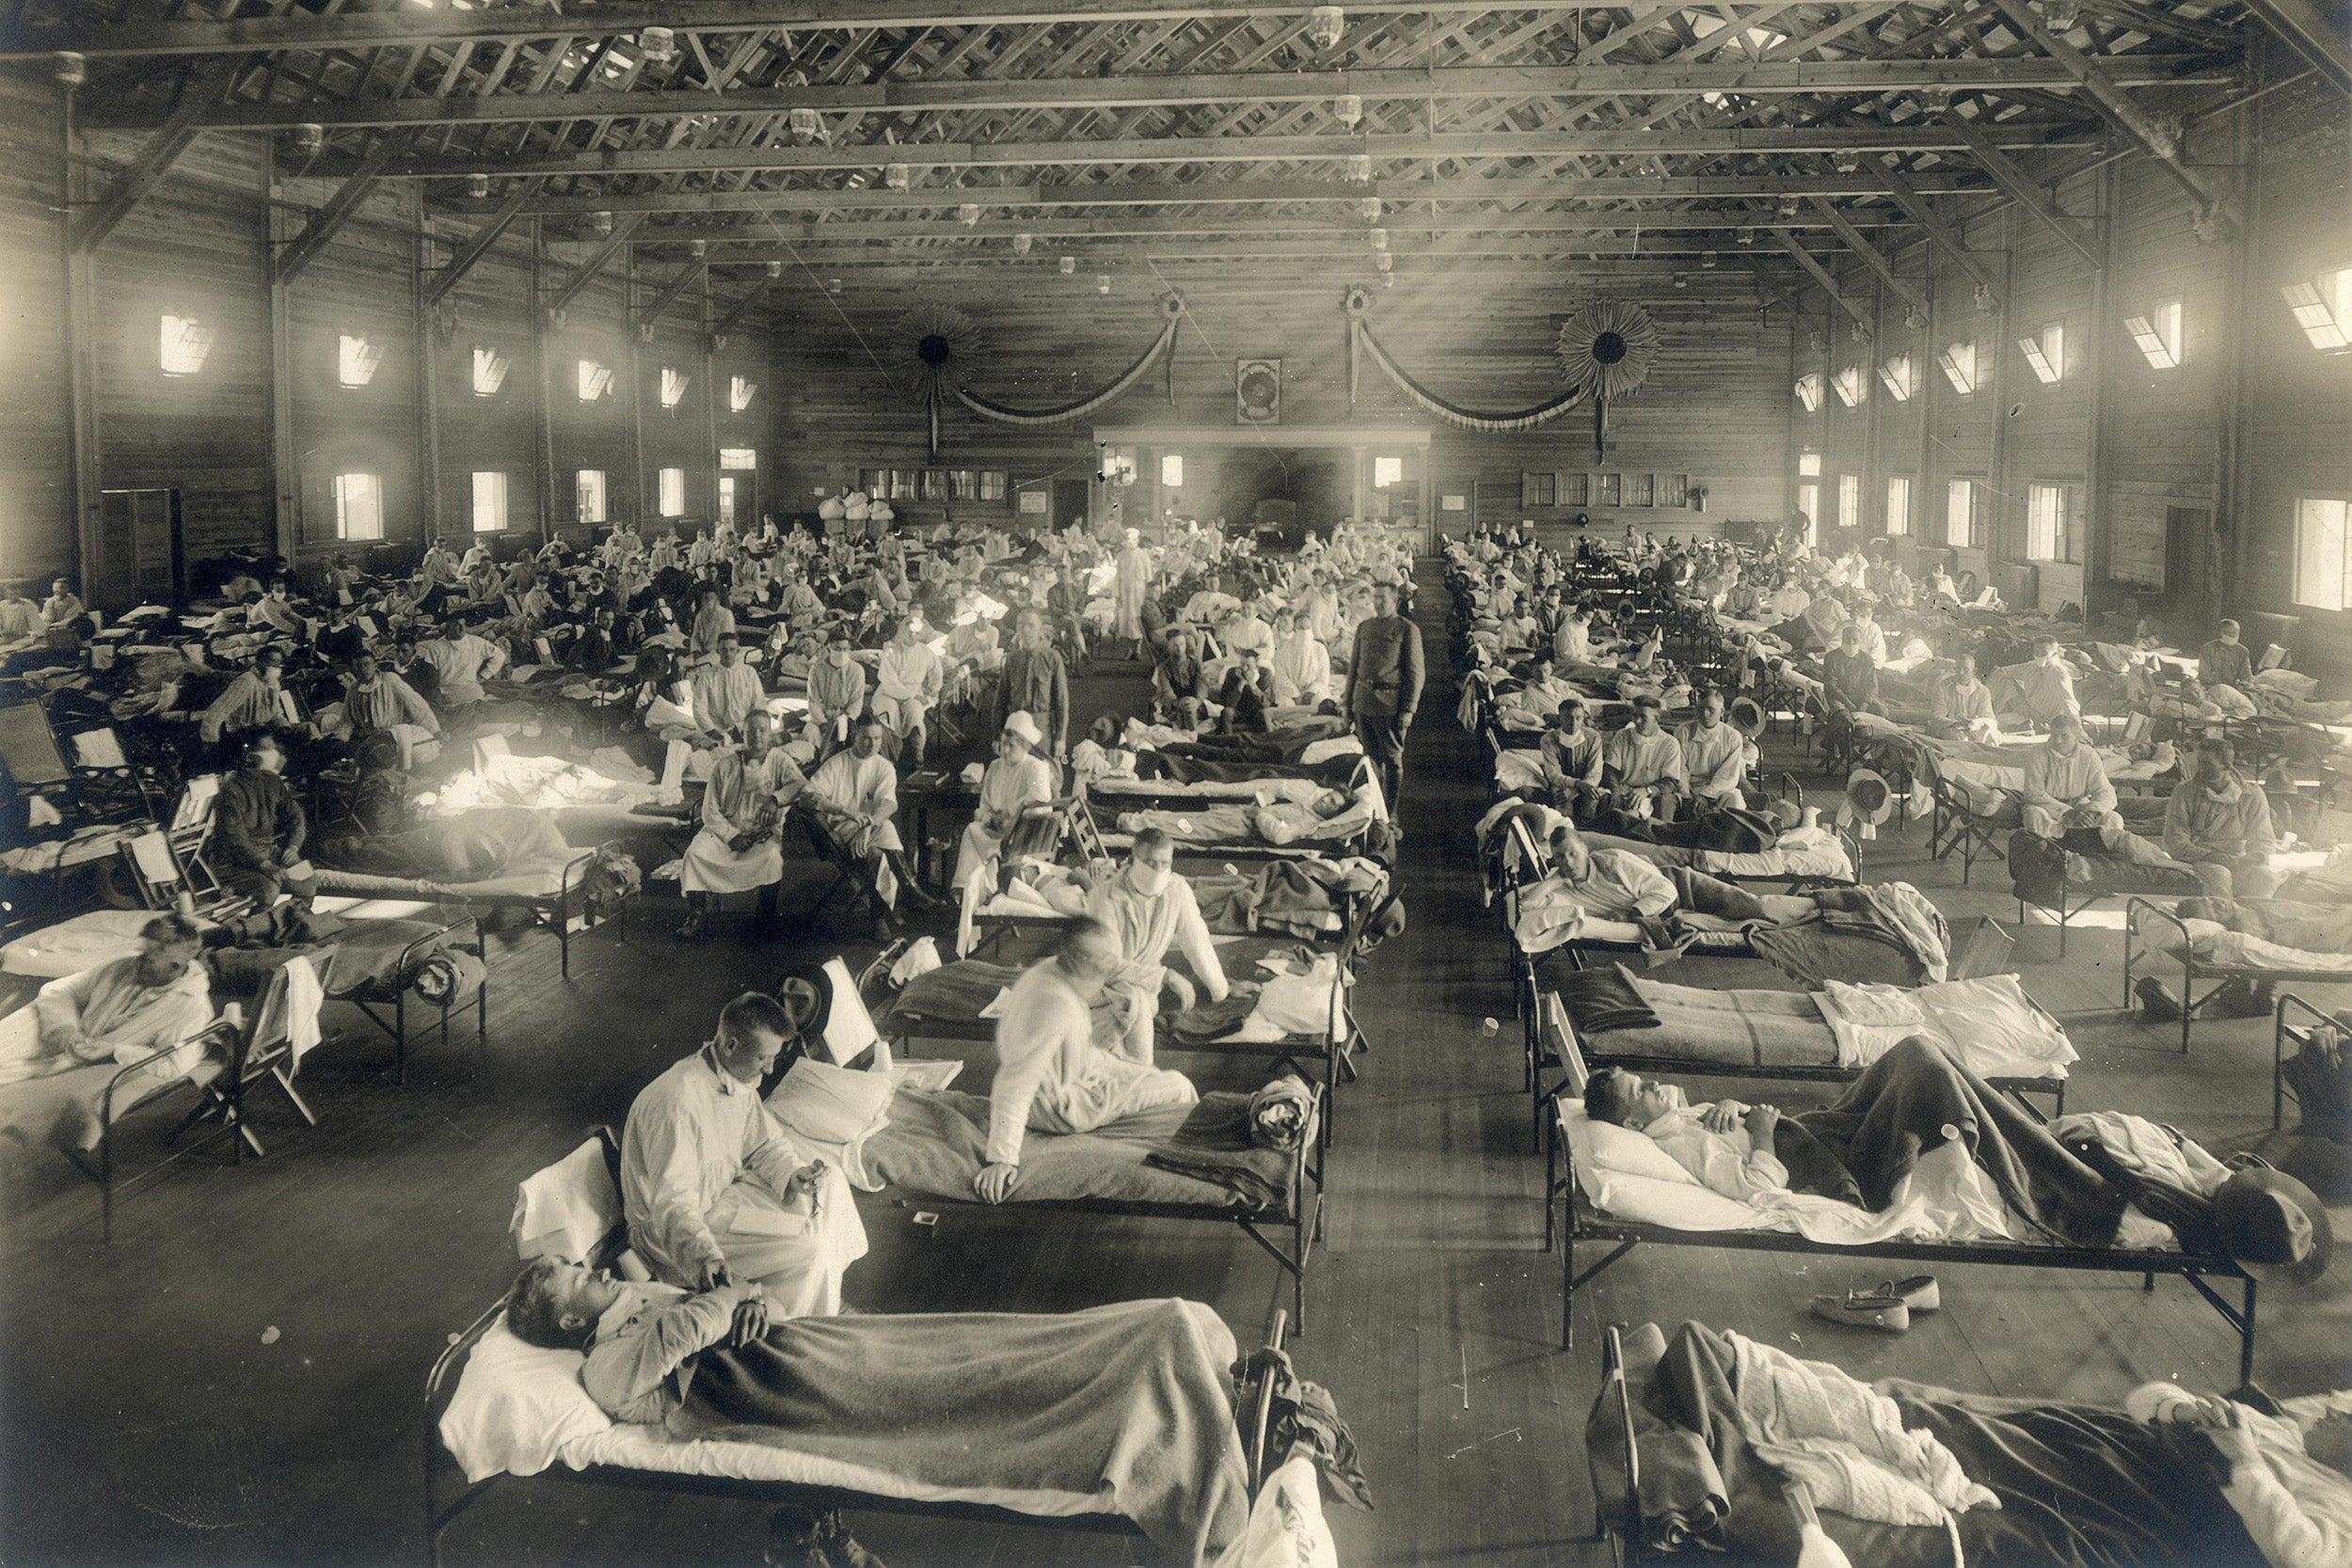 Emergency hospital.